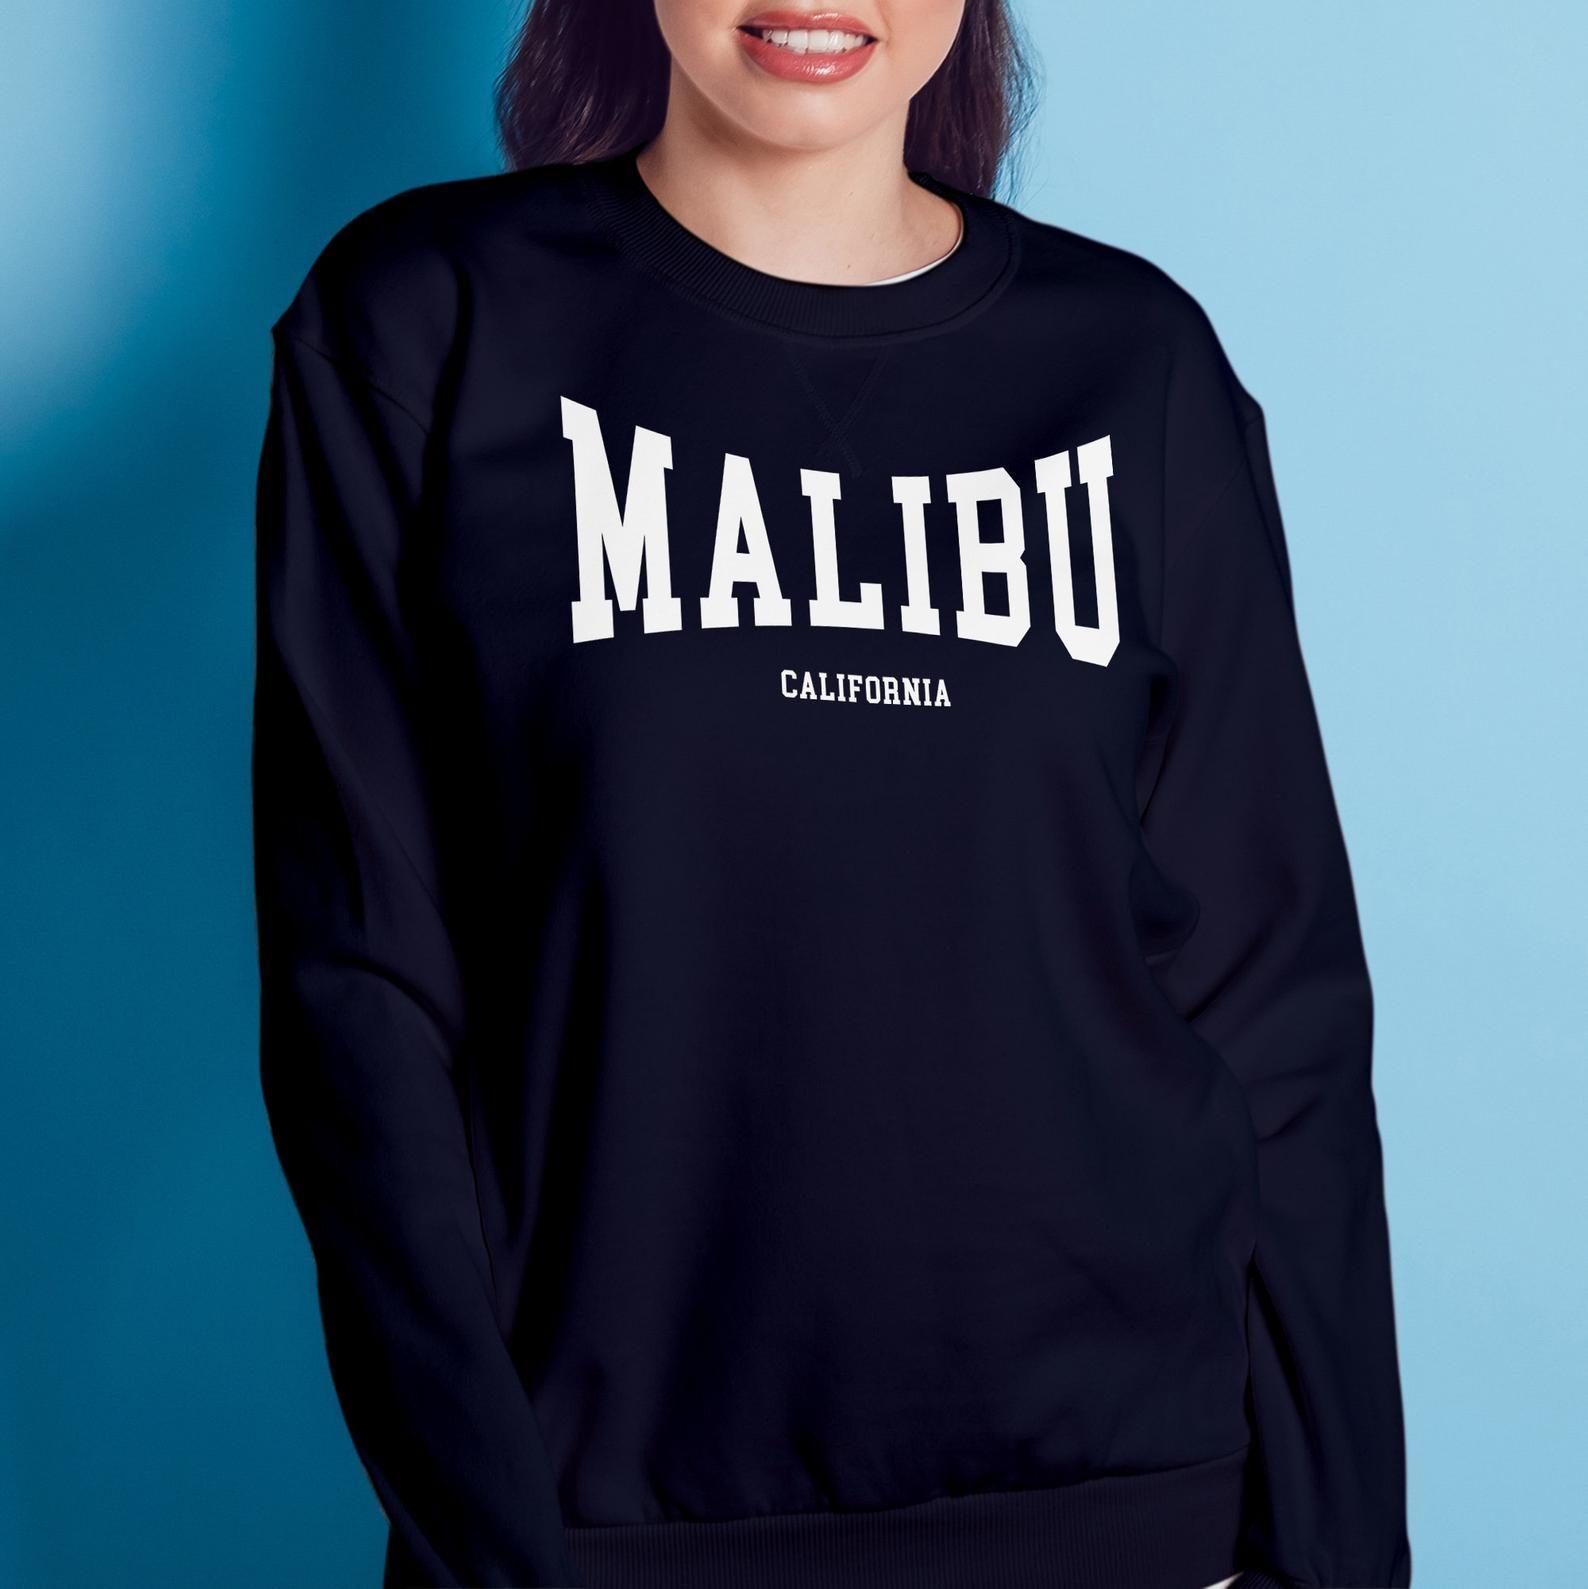 Malibu Crewneck Sweatshirt California Home Pride City Etsy In 2021 Indiana Shirt Sweatshirts Crew Neck Sweatshirt [ 1589 x 1588 Pixel ]